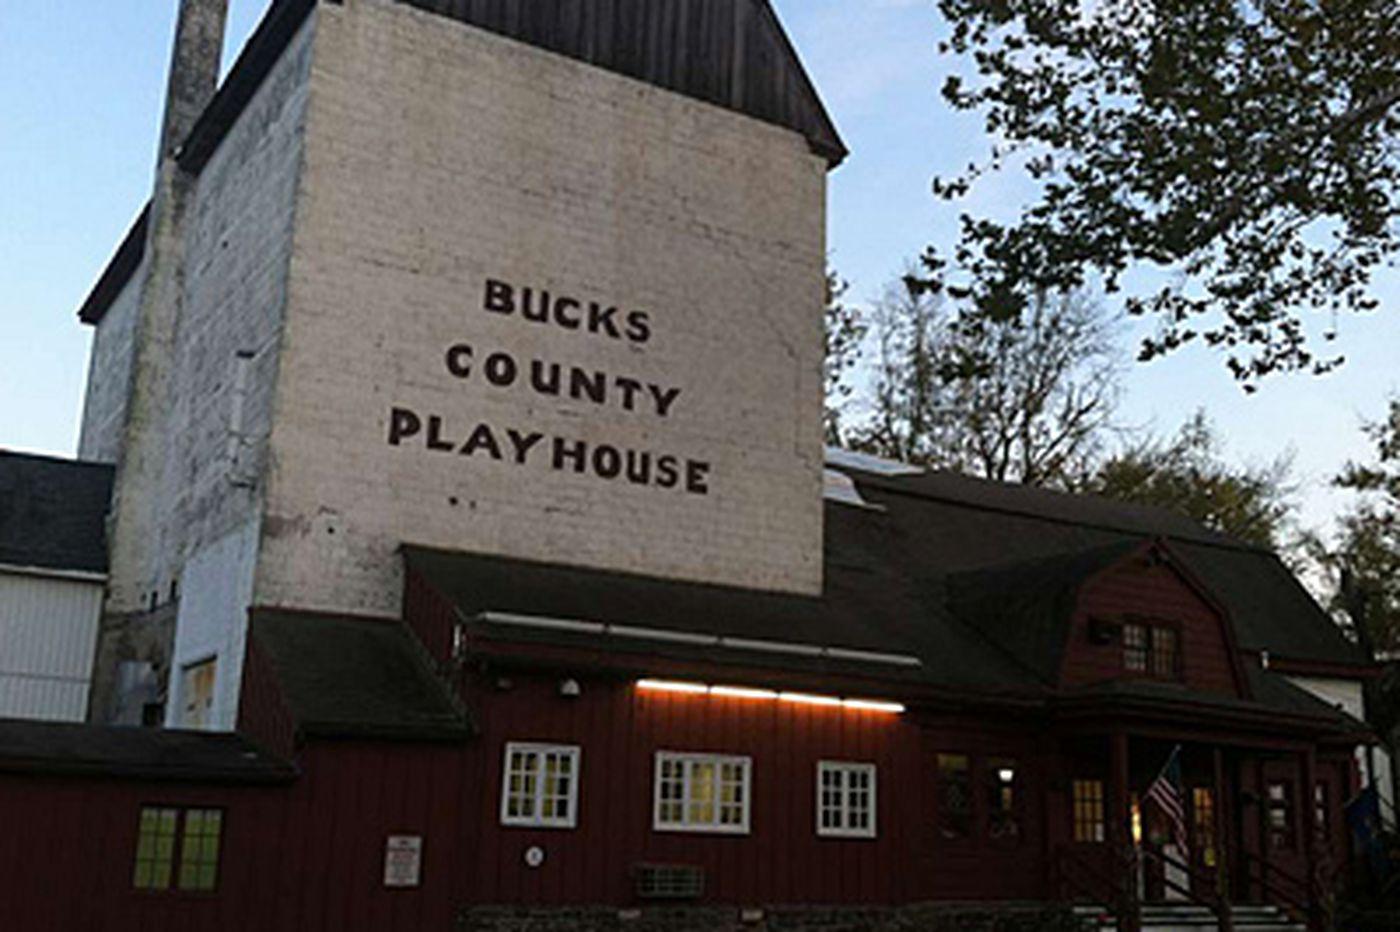 Bucks County couple save historic New Hope playhouse